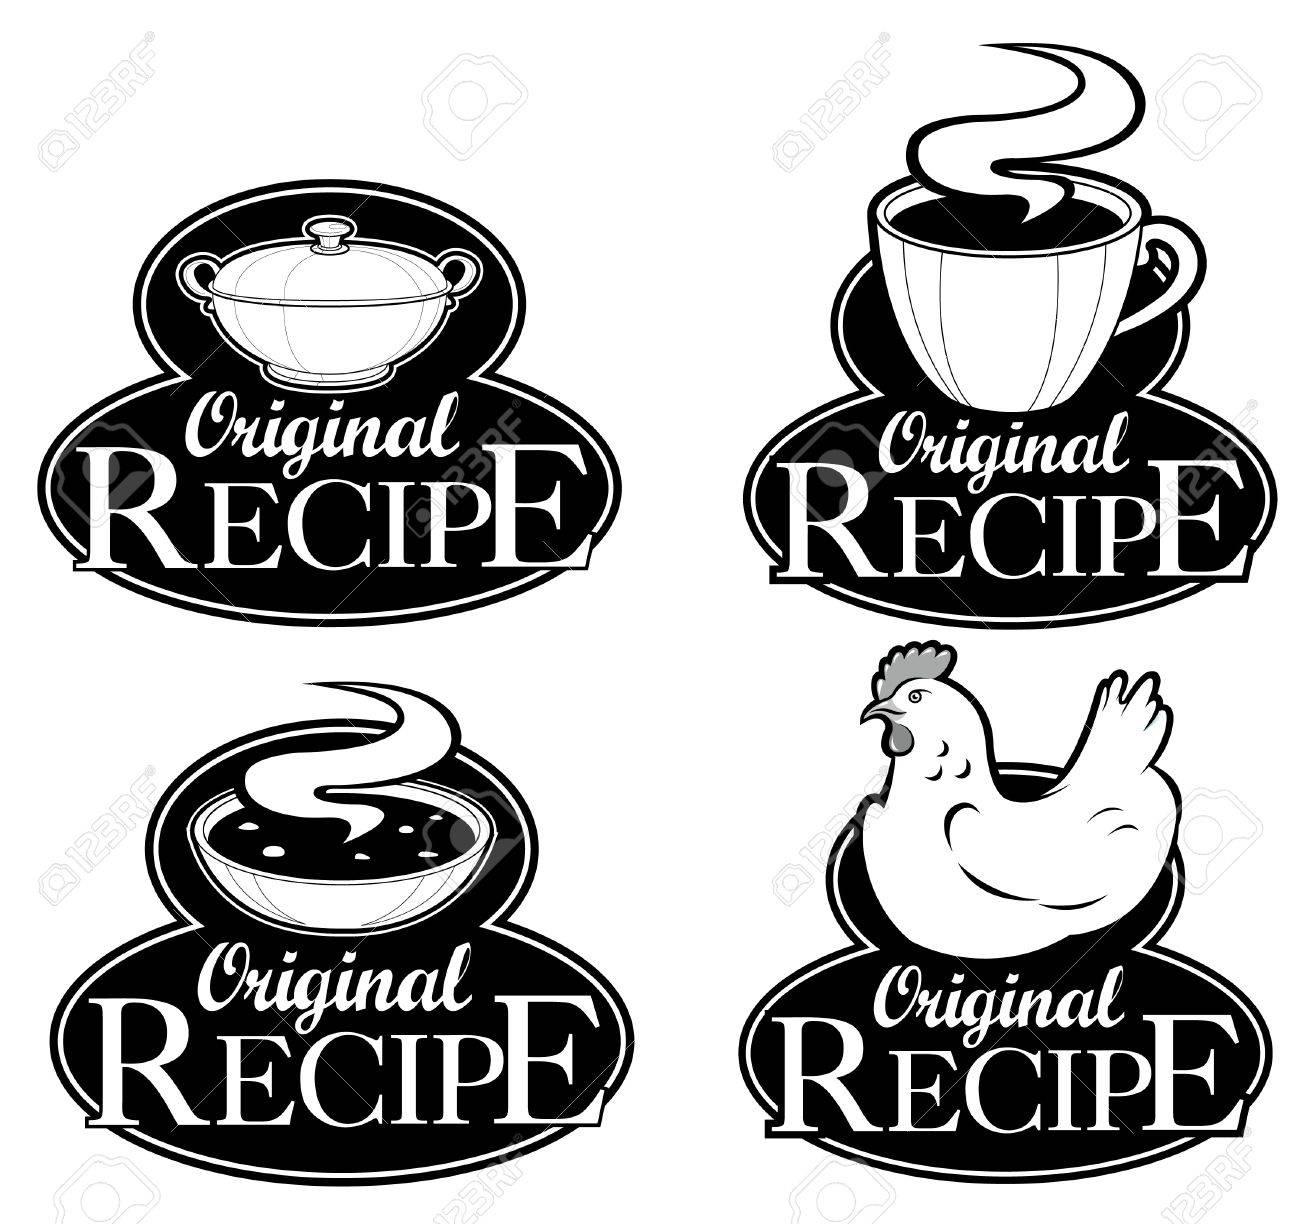 Original Recipe Seals Collection Stock Vector - 9674528